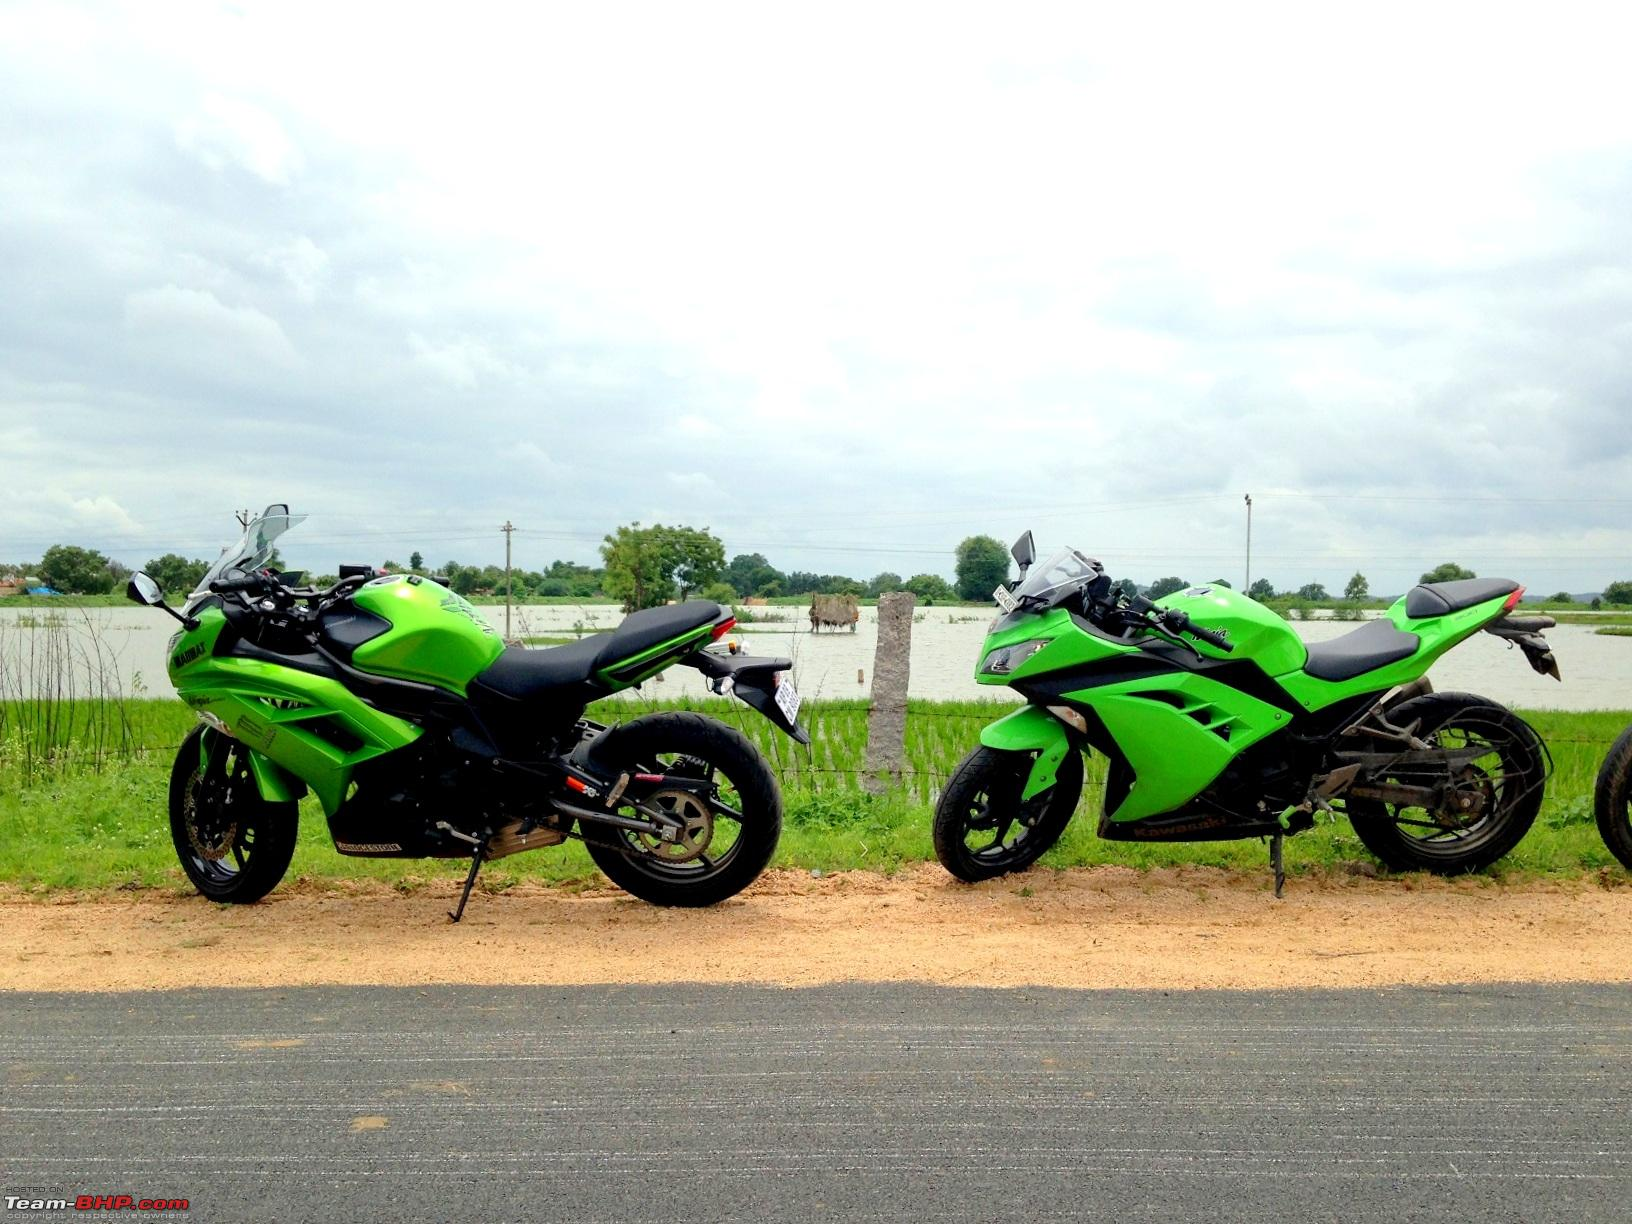 Kawasaki ninja 300 forum 650cc engine swap - Ninja 300 forum ...